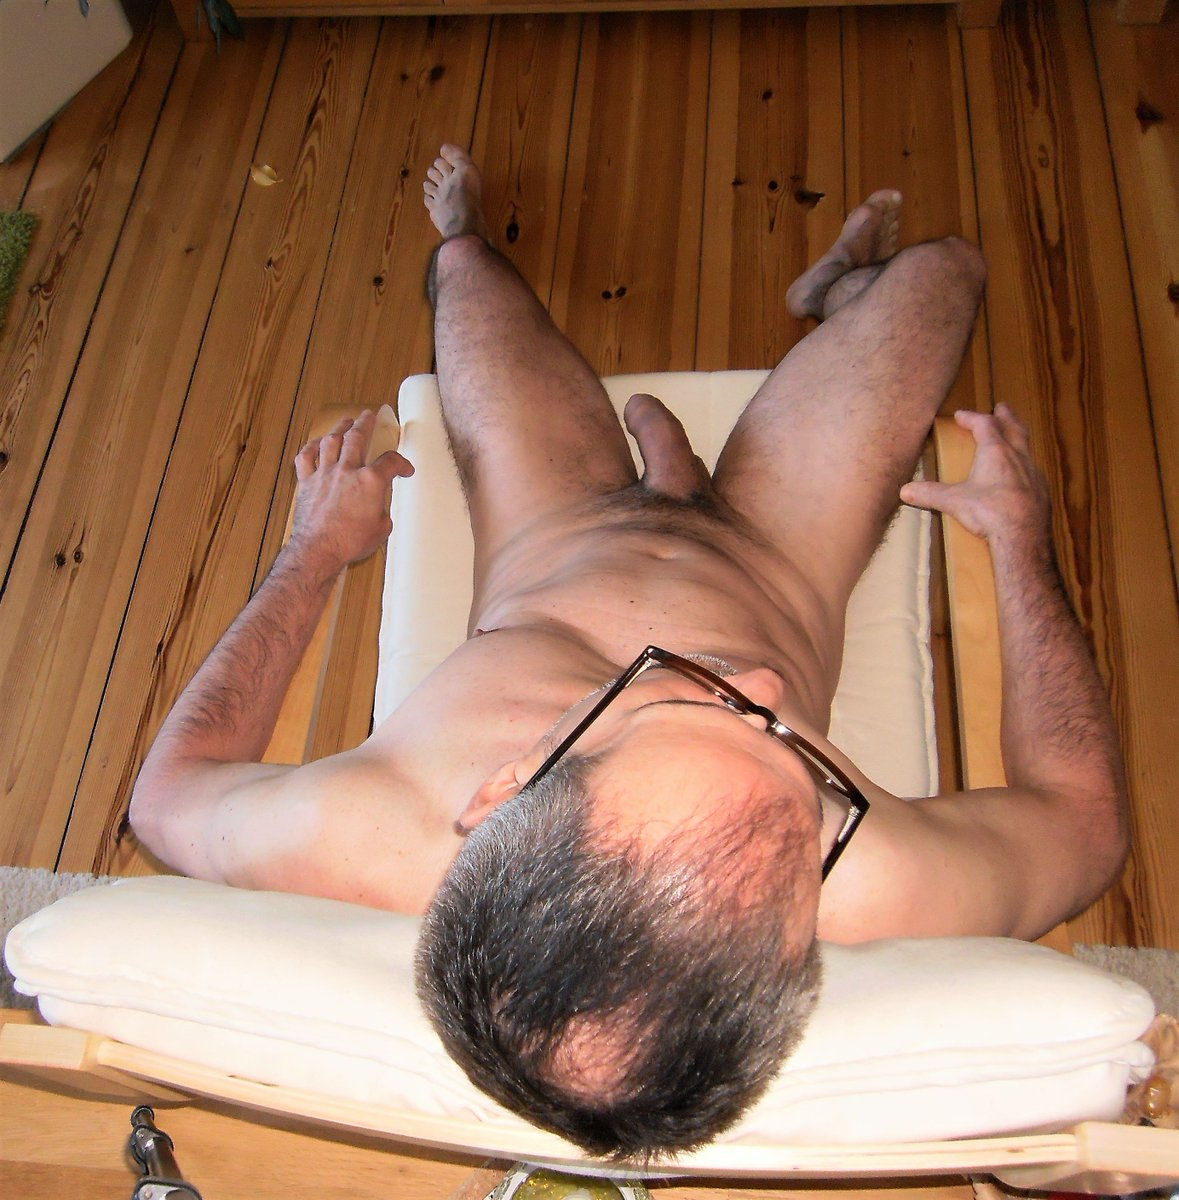 Thailand nudist resort